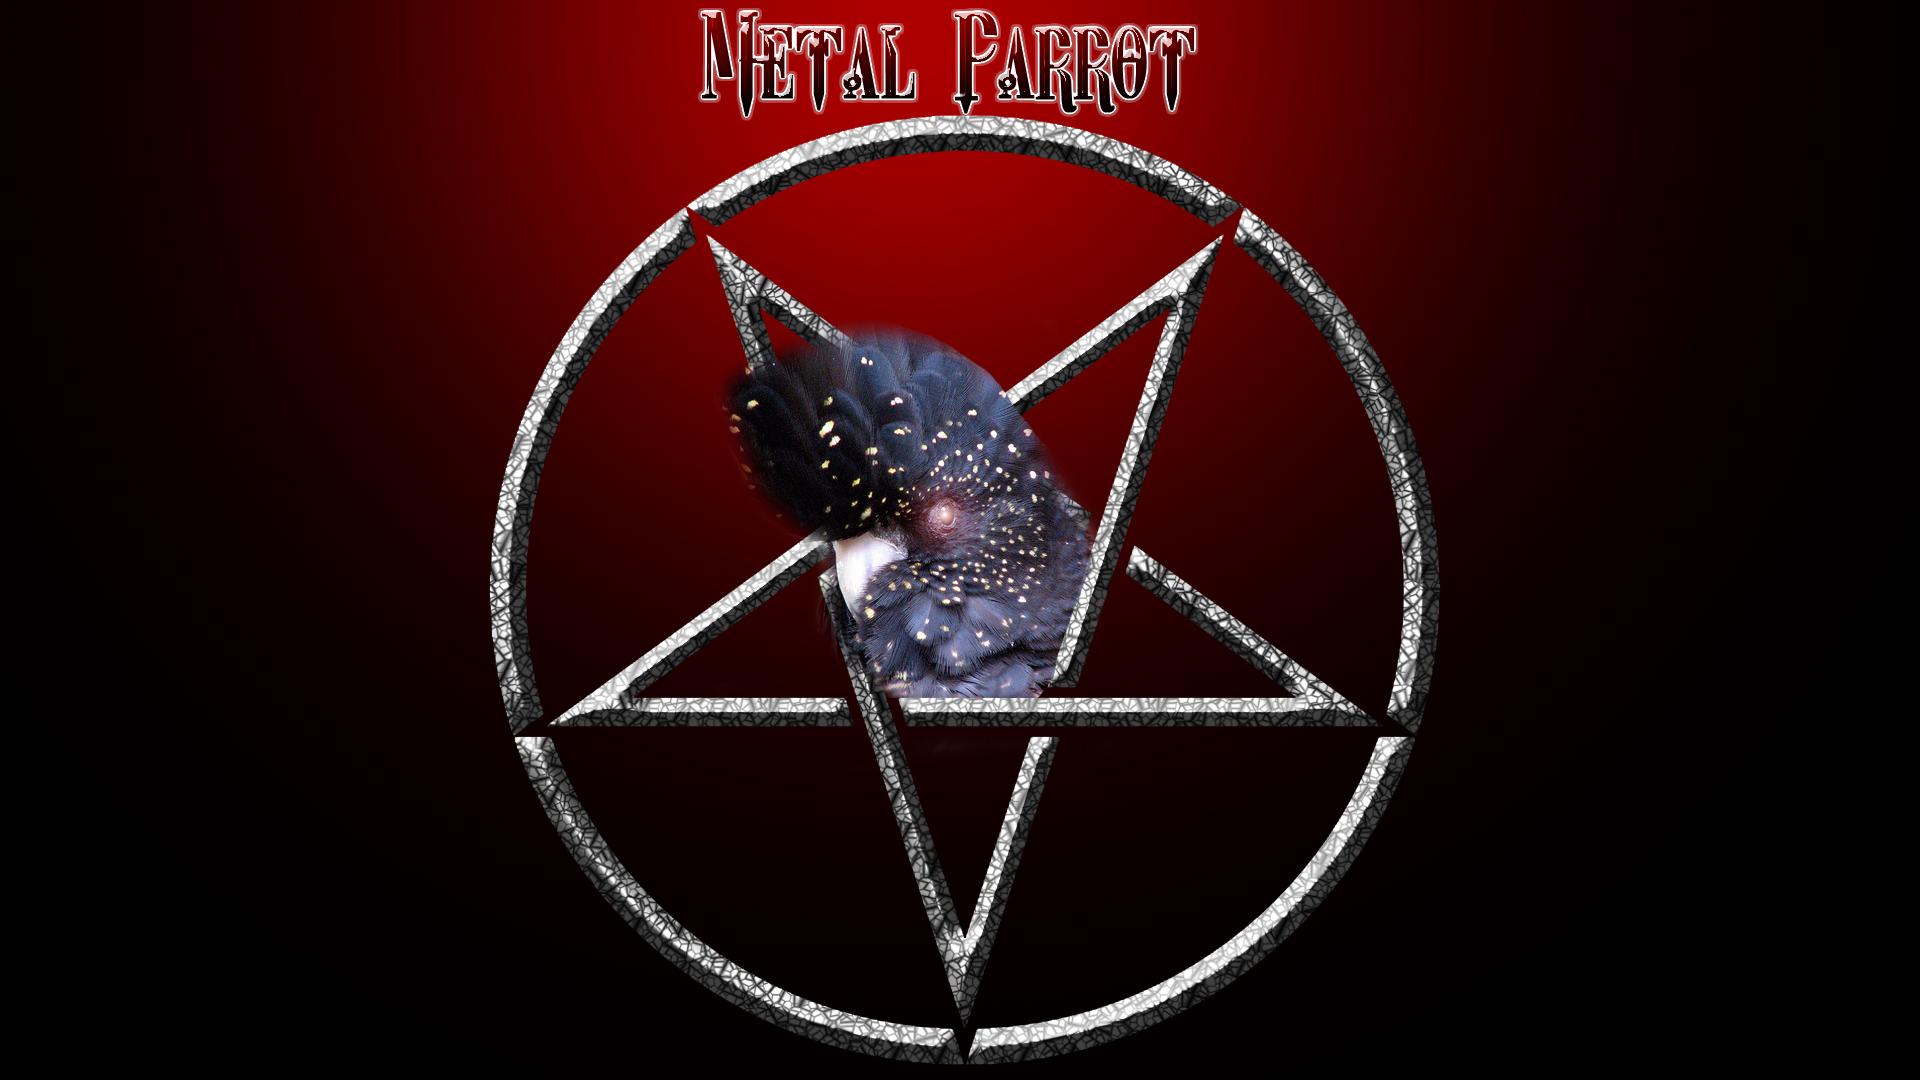 The Metal Parrot!